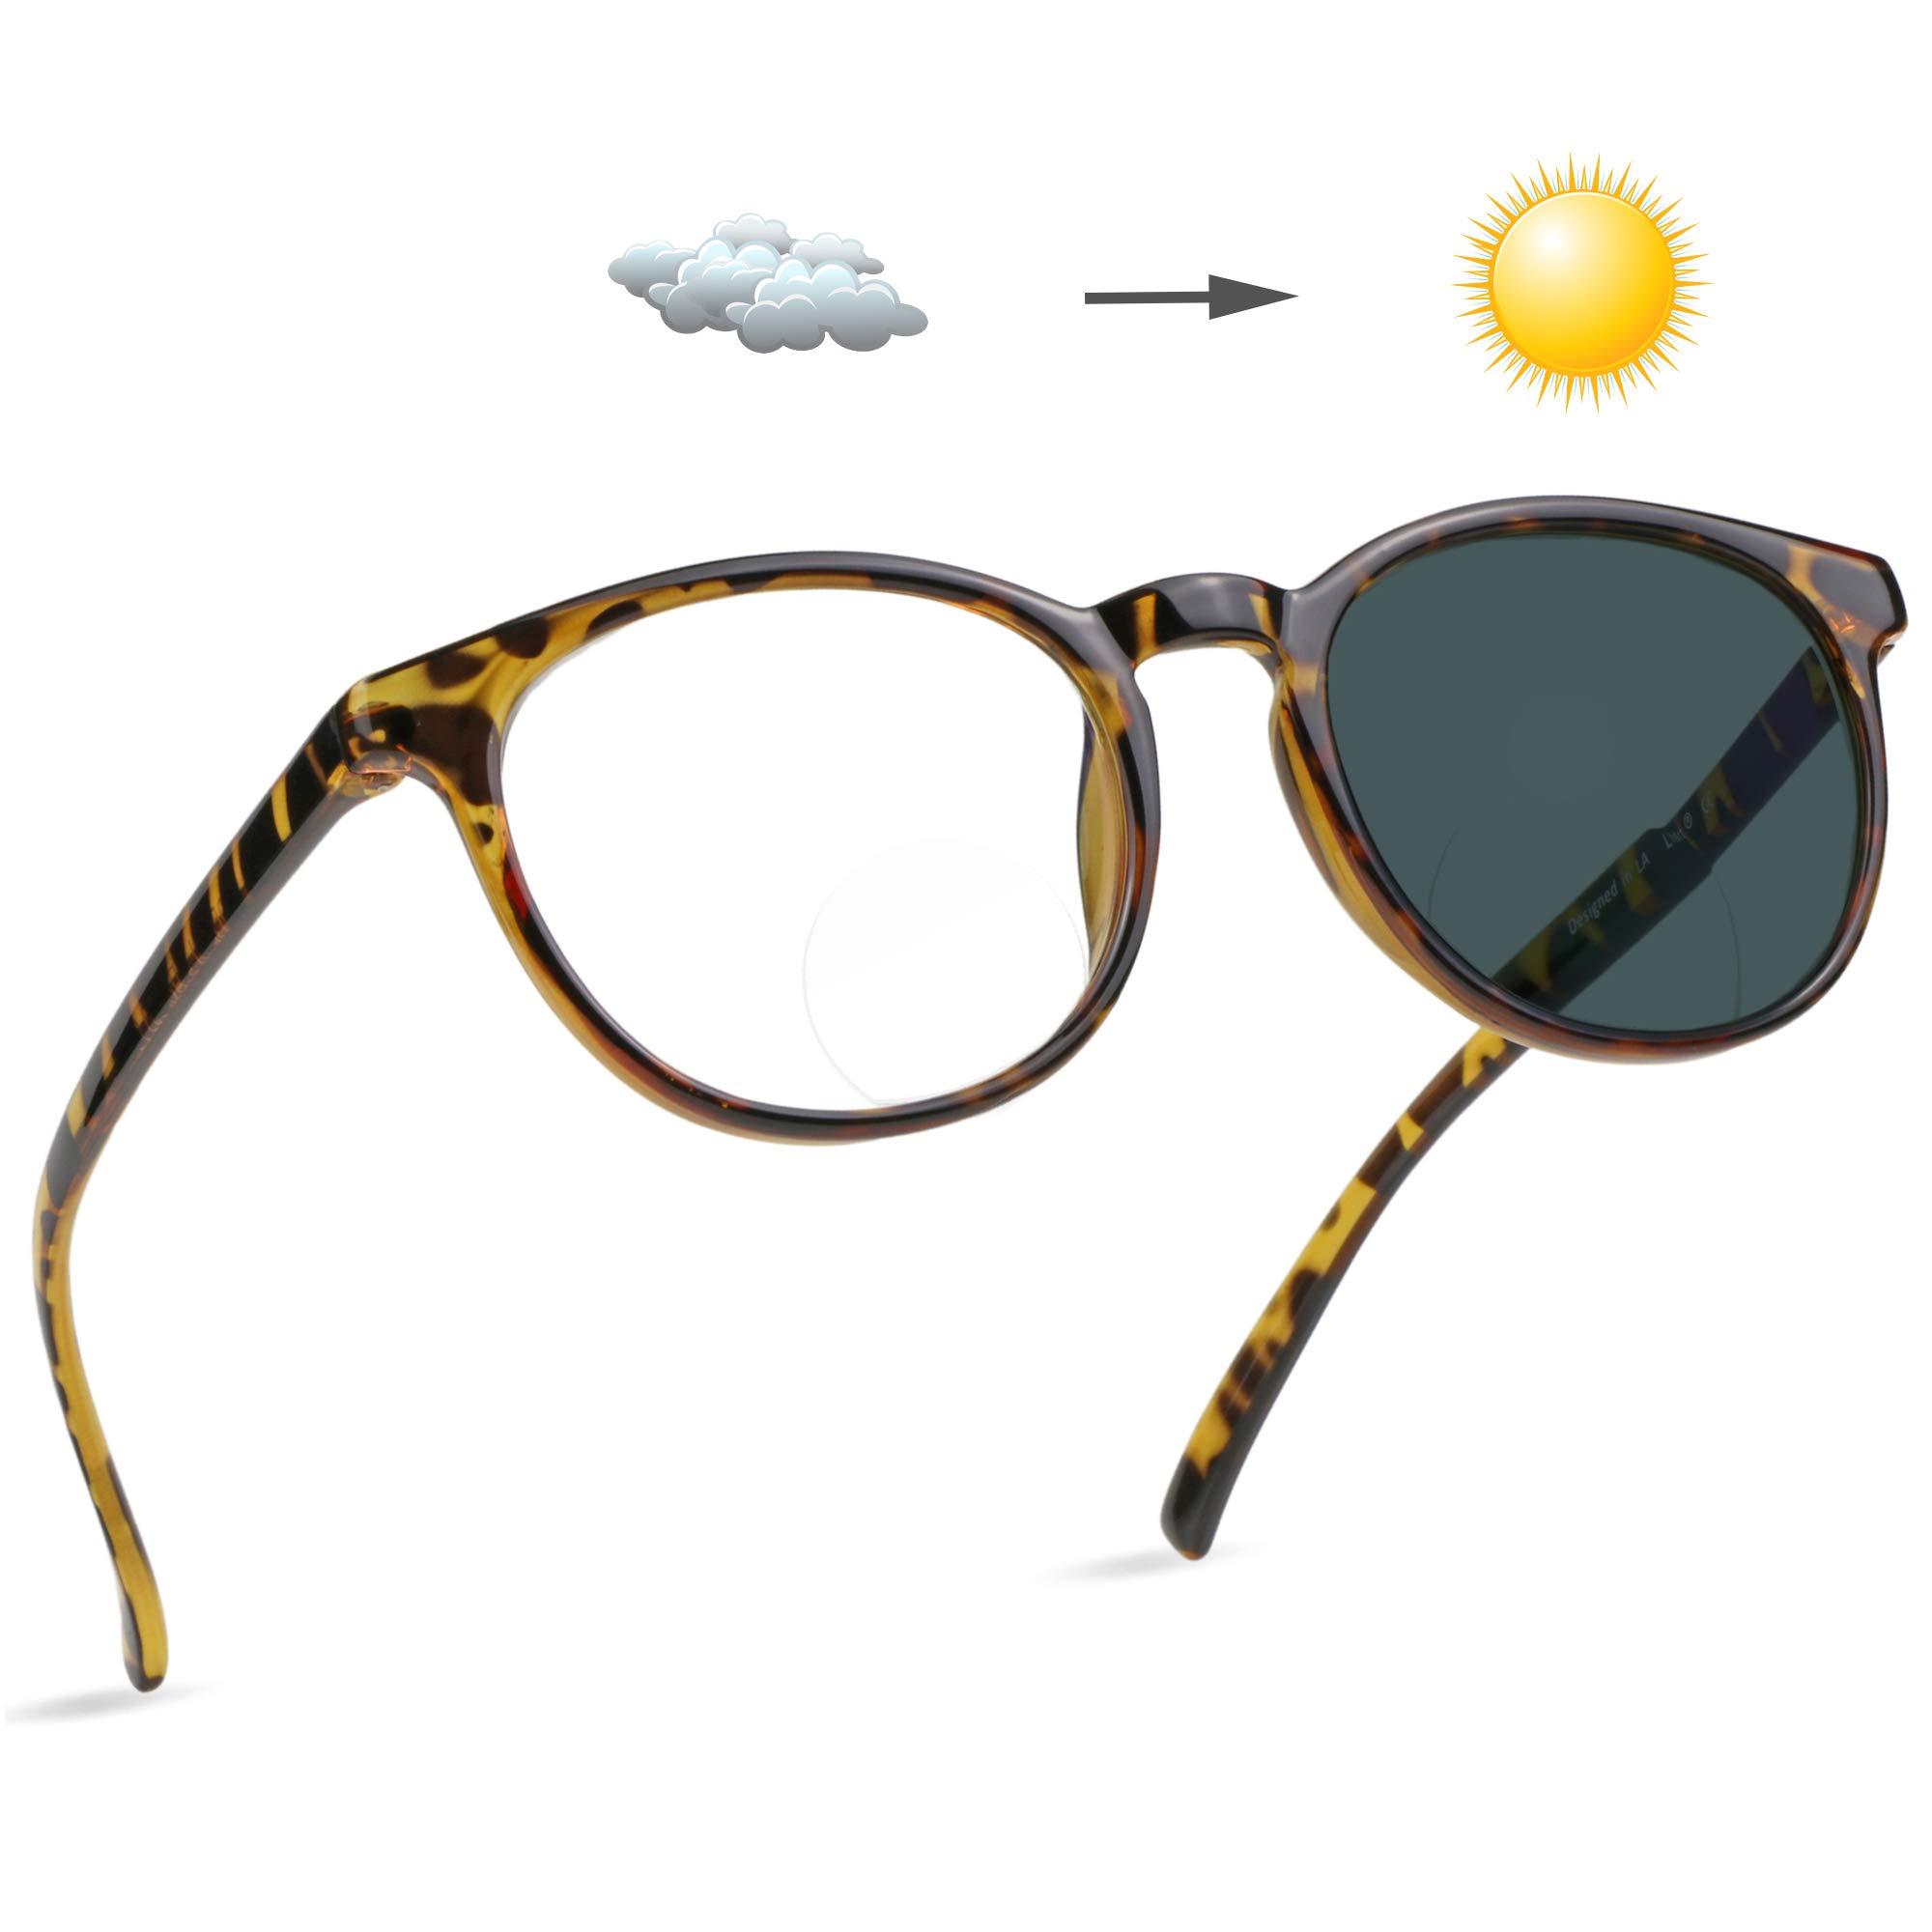 LifeArt Bifocal Reading Glasses, Photochromic Dark Grey Sunglasses with Round Frame +1.50 Magnification for Women/Men, (Tortoise)